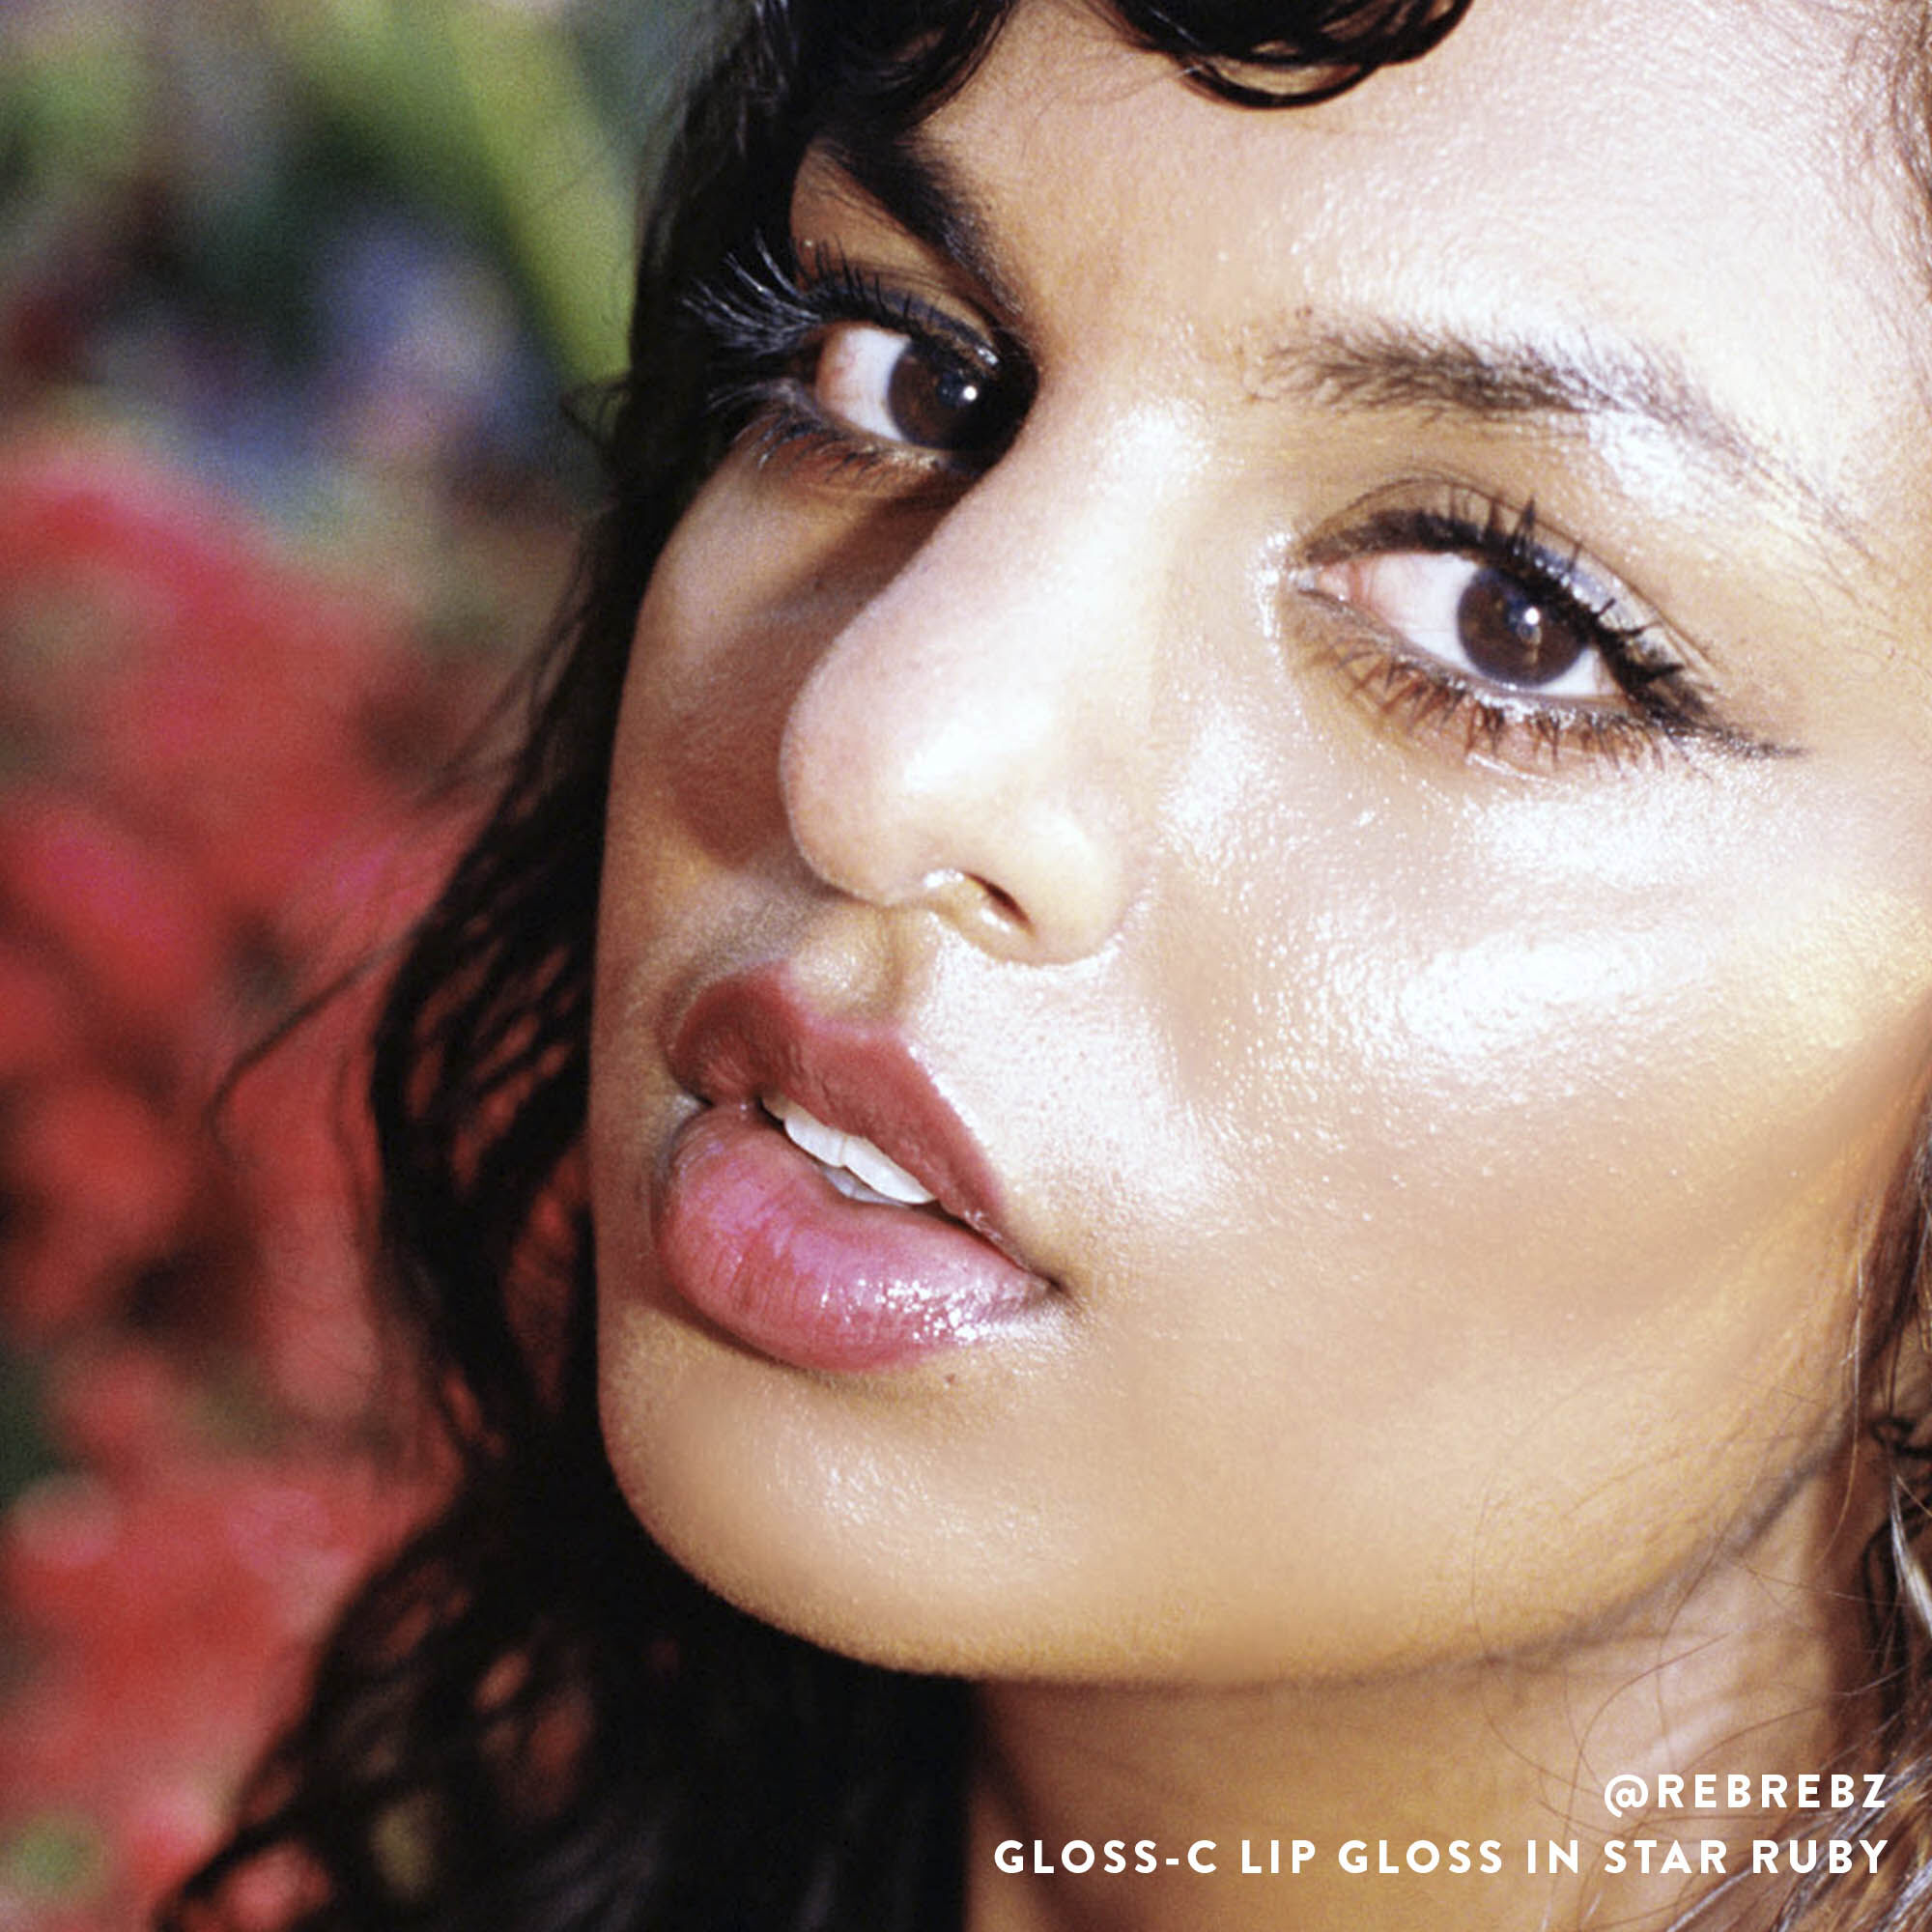 Gloss-C Lip Gloss, Star Ruby